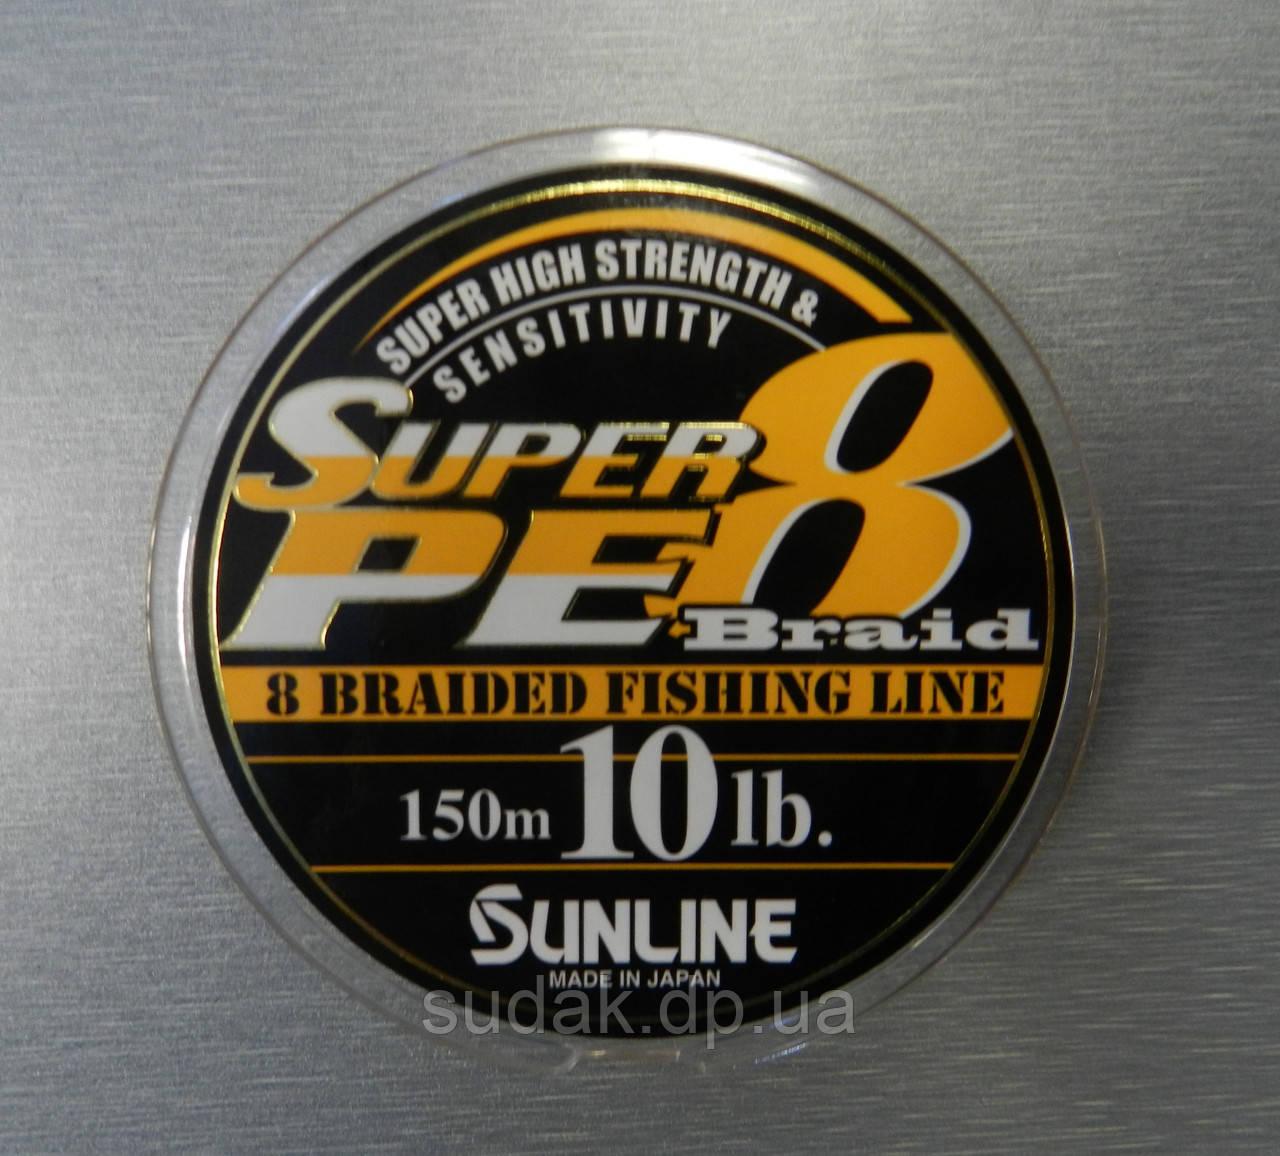 Шнур Sunline Super PE 8 Braid 150m 0.165mm 10lb/5kg